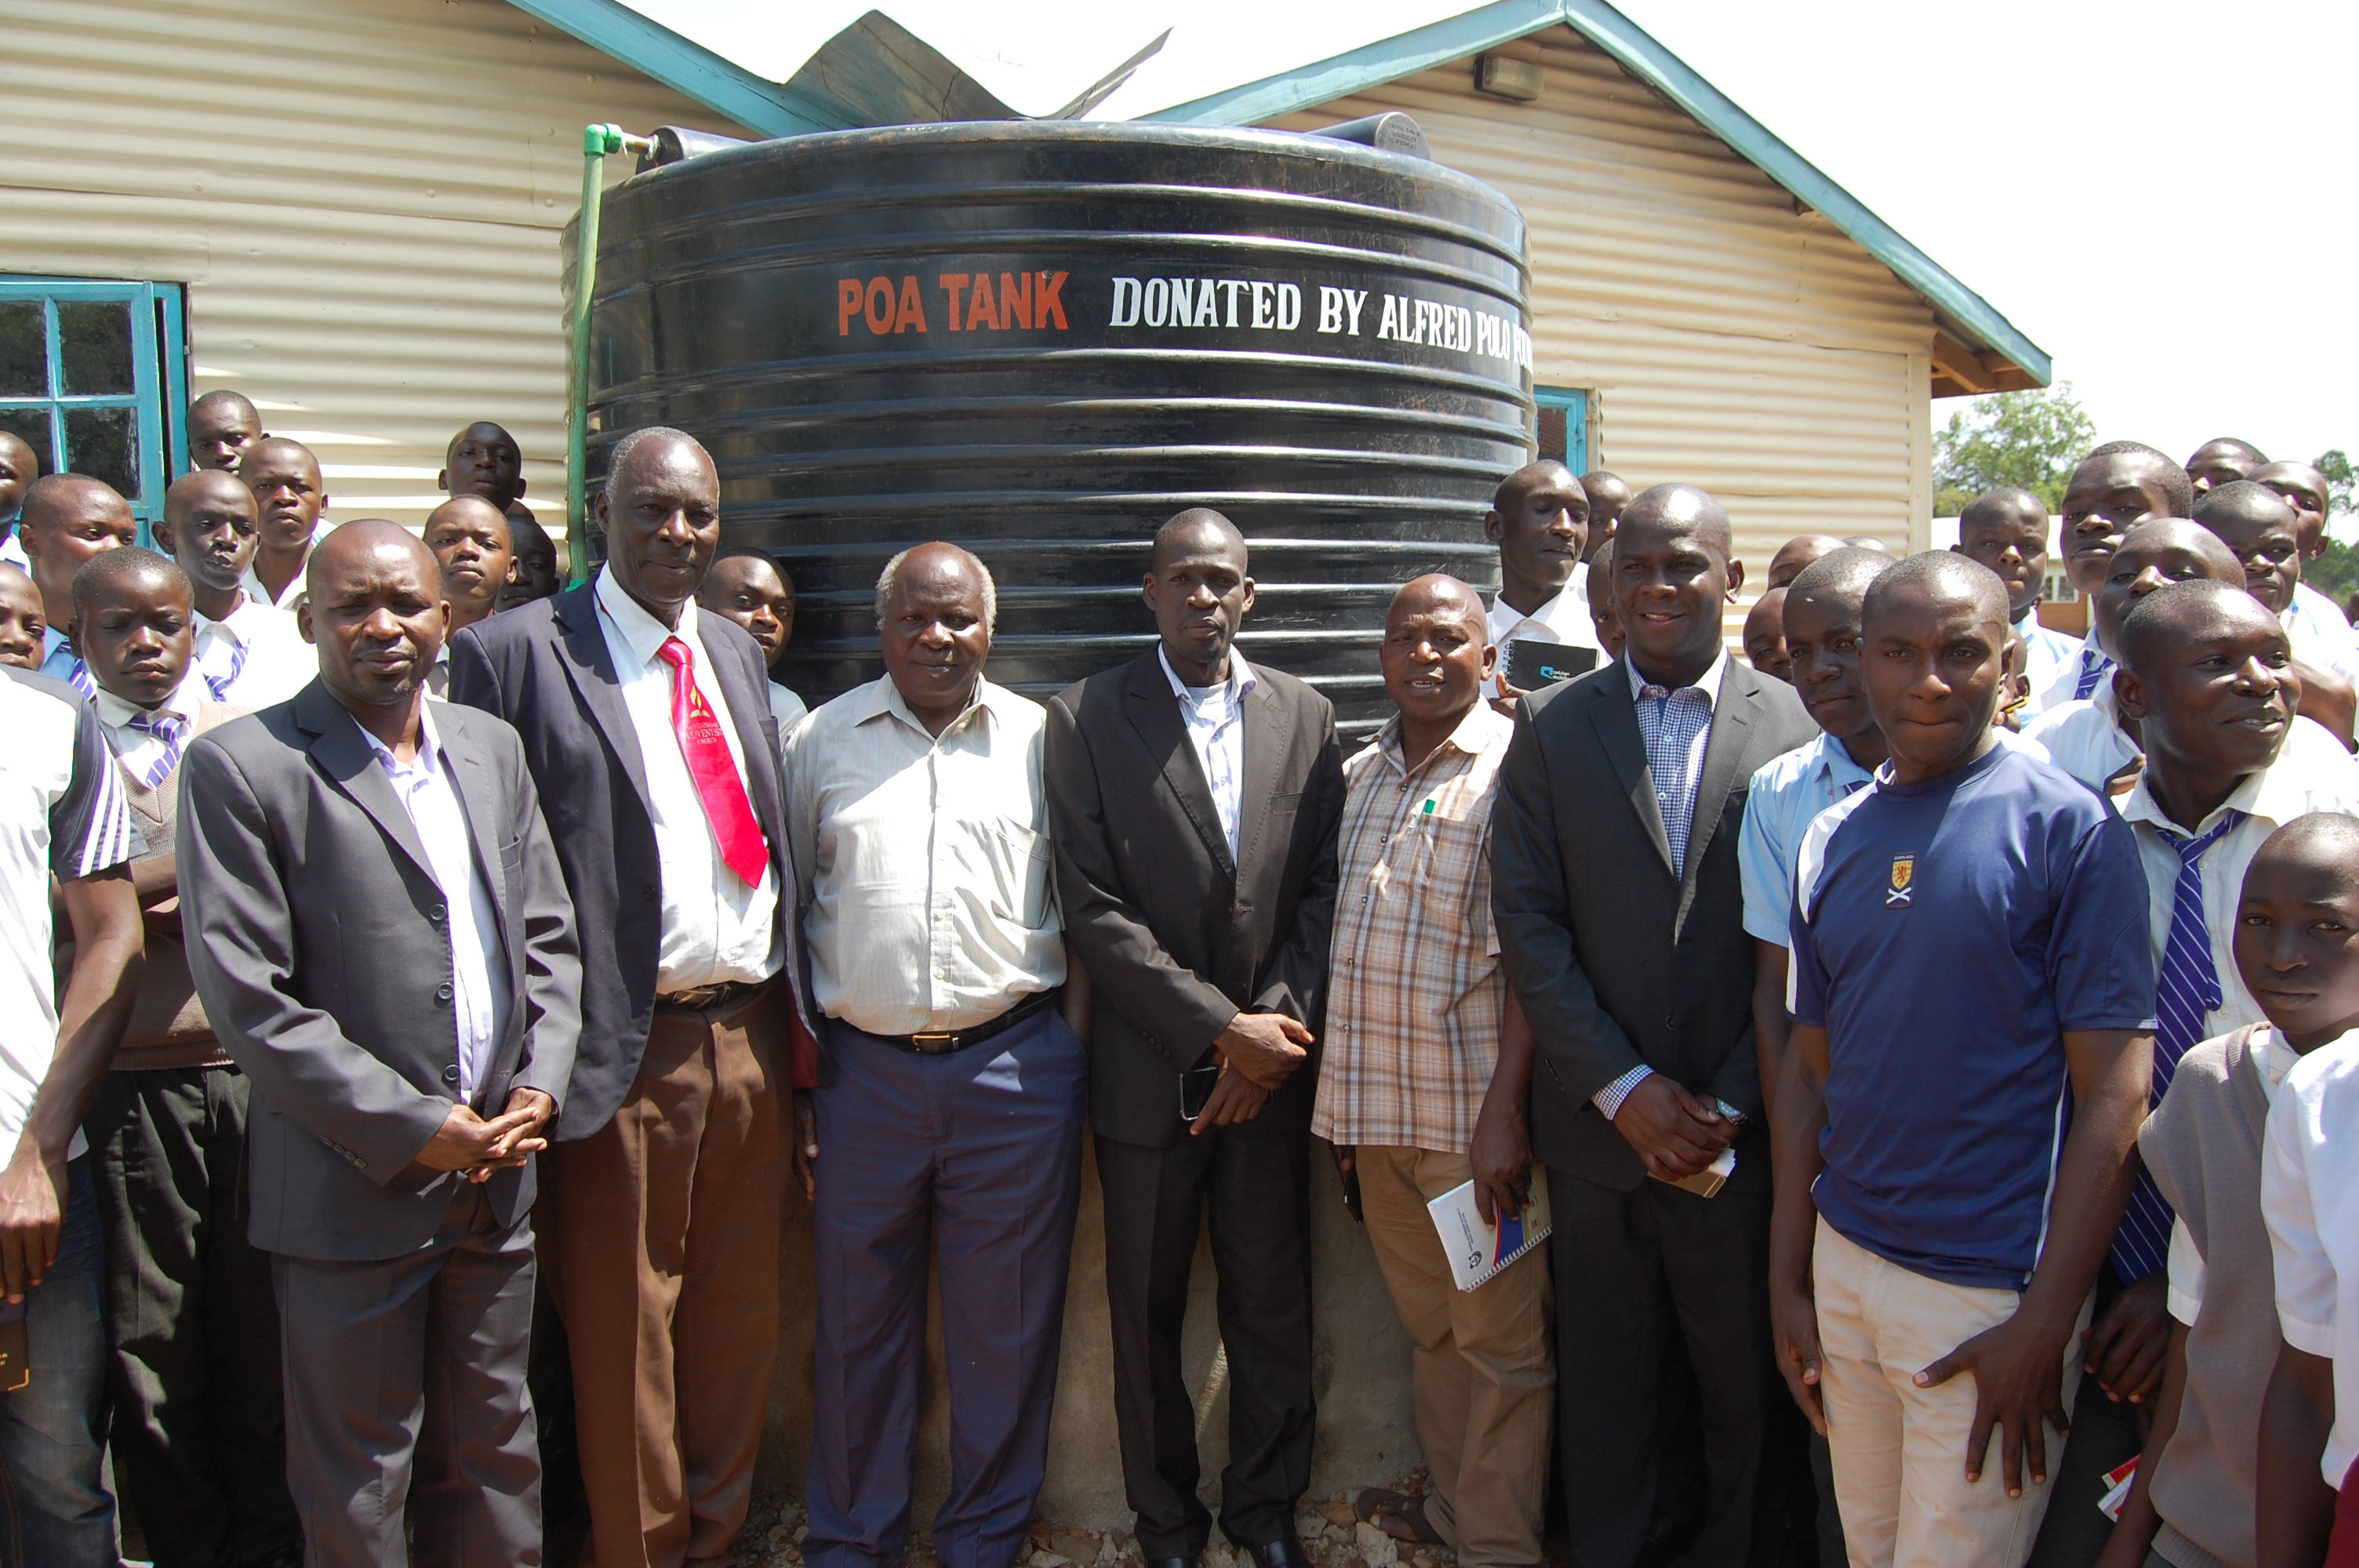 Launch of Water Tank at Mirogi Boys Secondary School